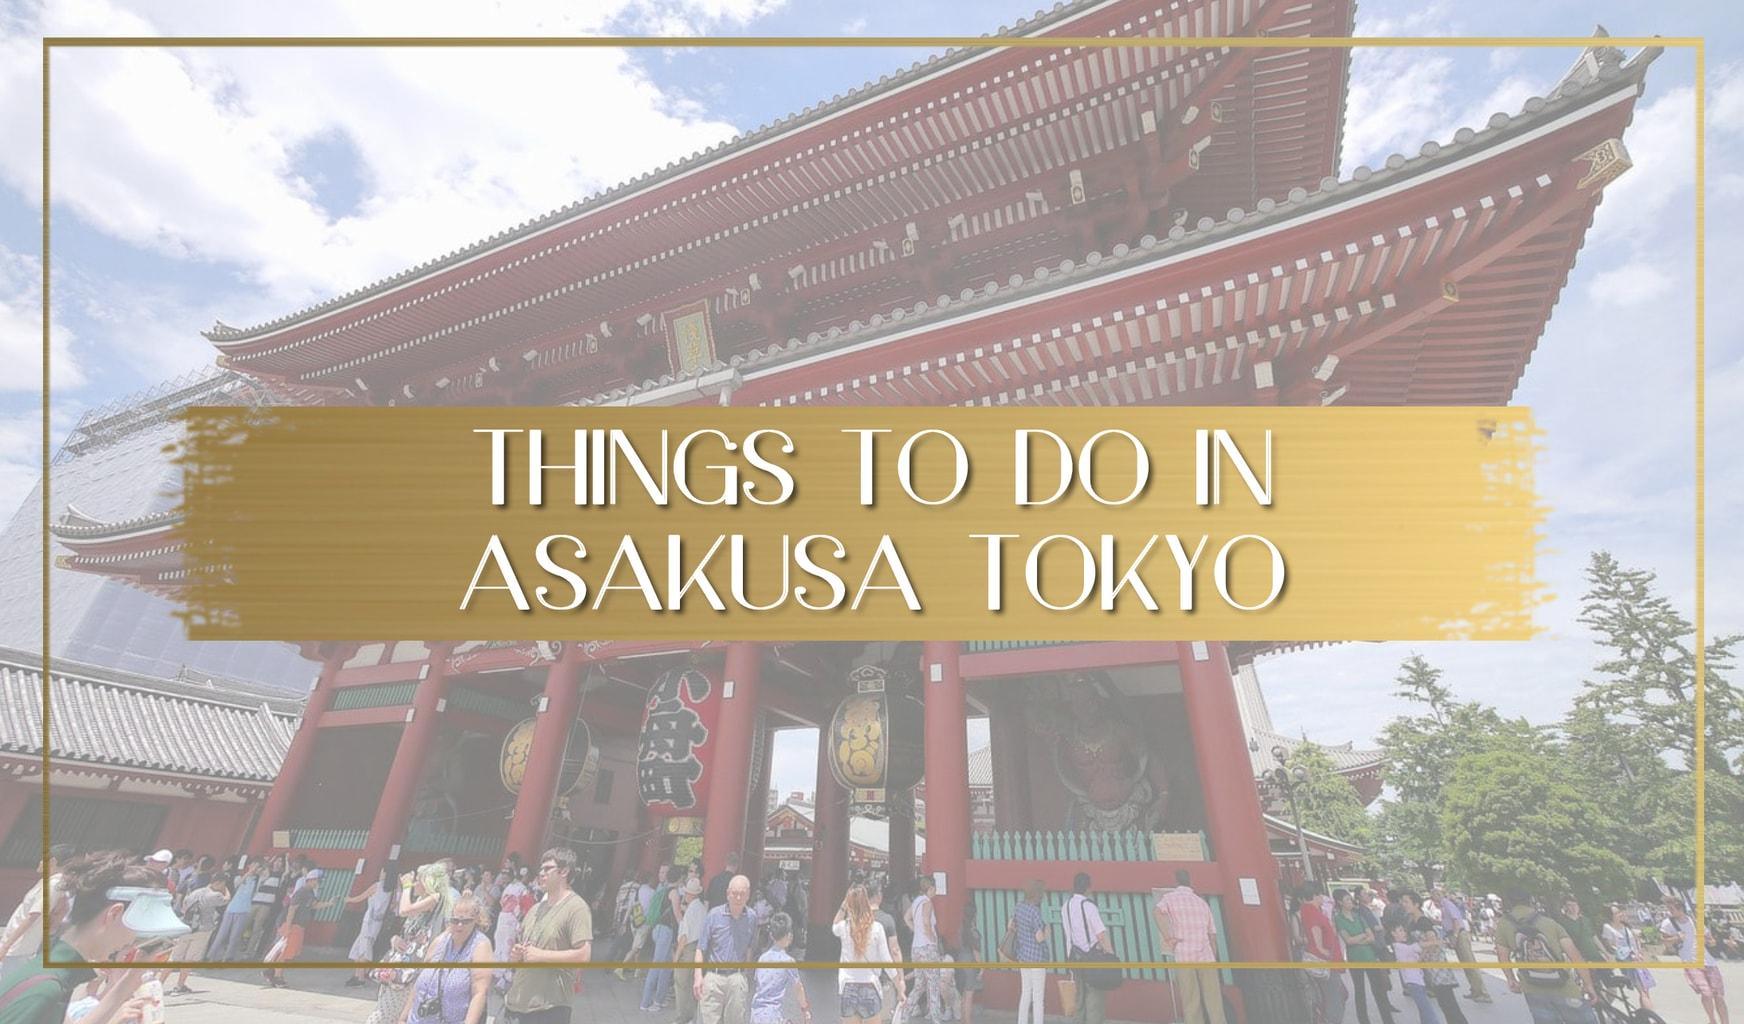 Things to do in Asakusa Tokyo main